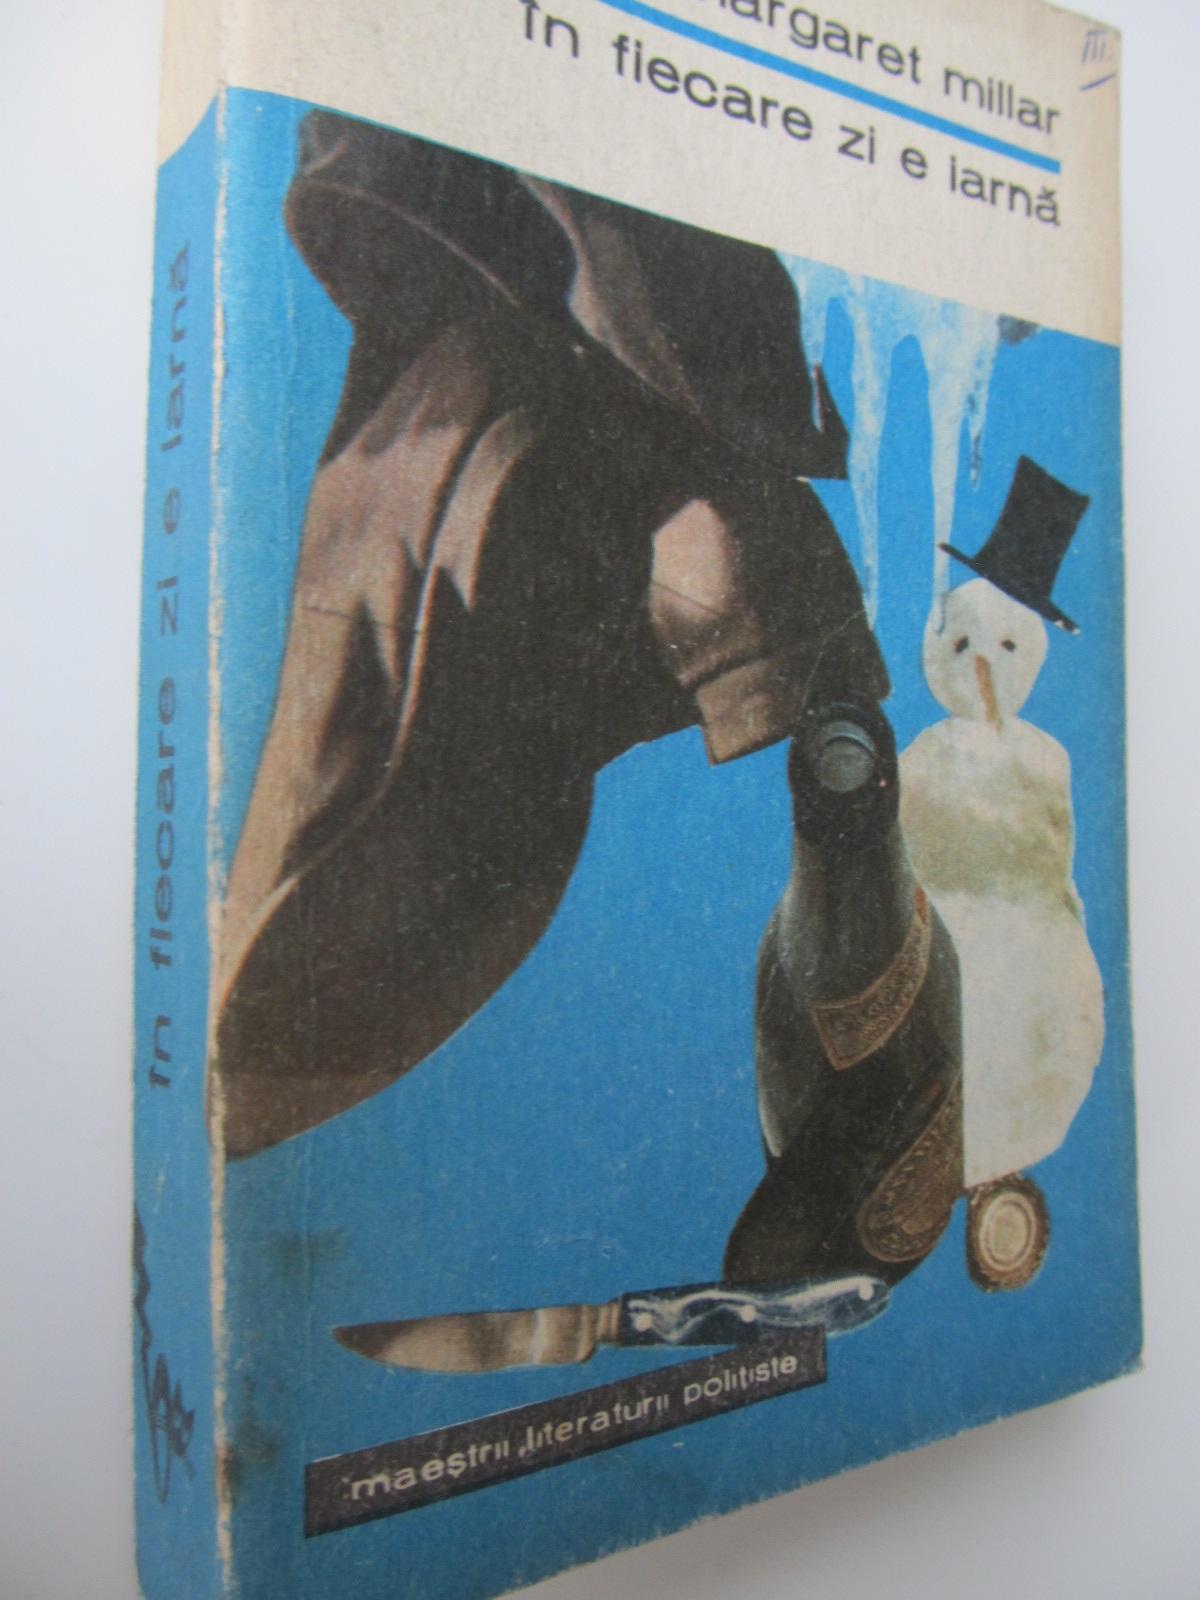 In fiecare zi e iarna - Margaret Millar | Detalii carte